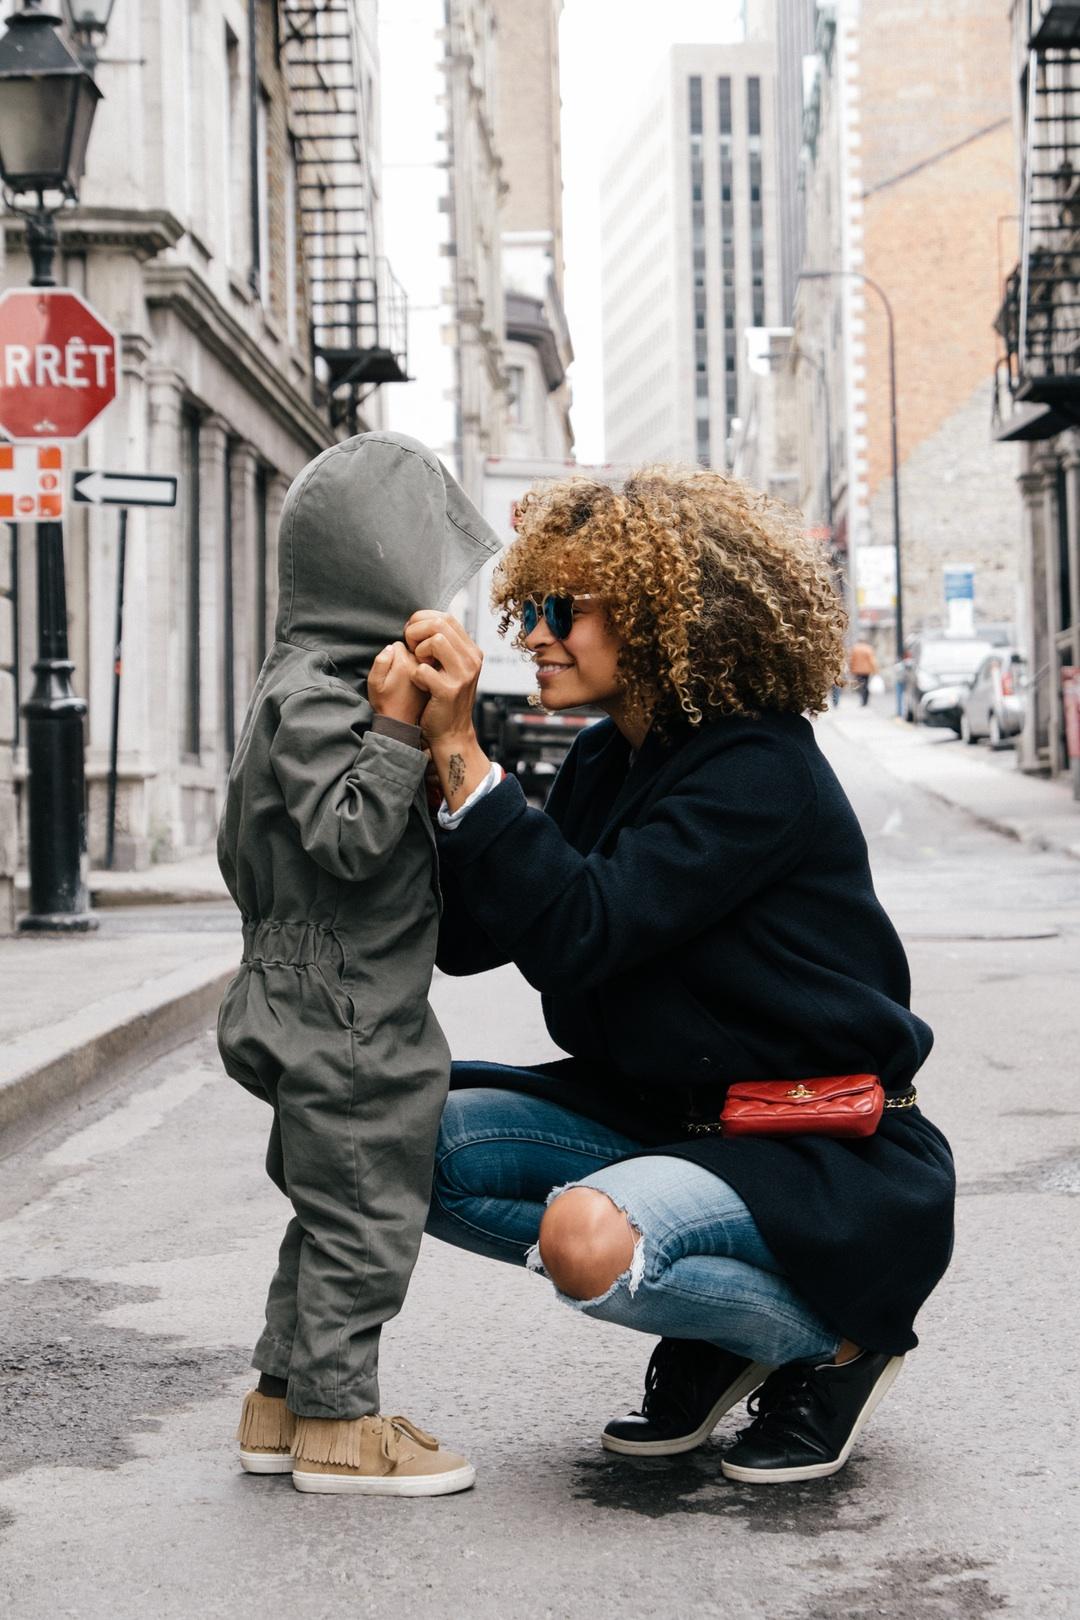 madre rizos hablando con nina capucha